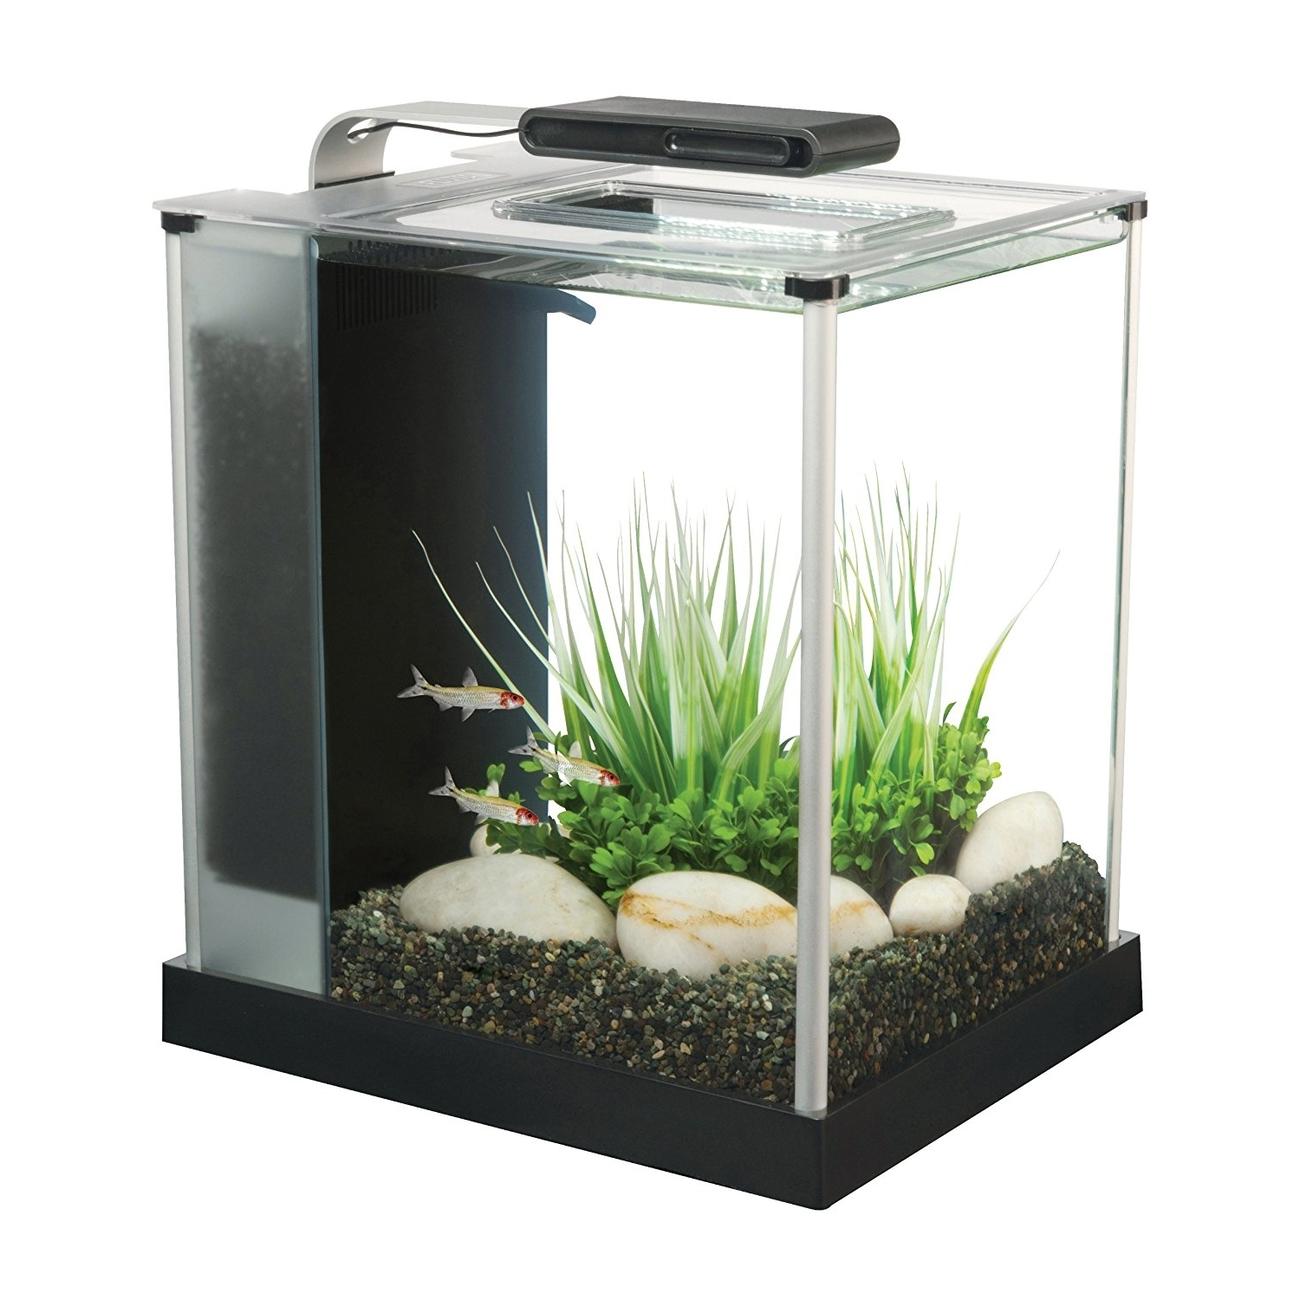 Hagen Fluval SPEC Süßwasser Aquarium Set, SPEC 3 - 10,7 l schwarz (22,3 x 30,5 x 27,5 cm)